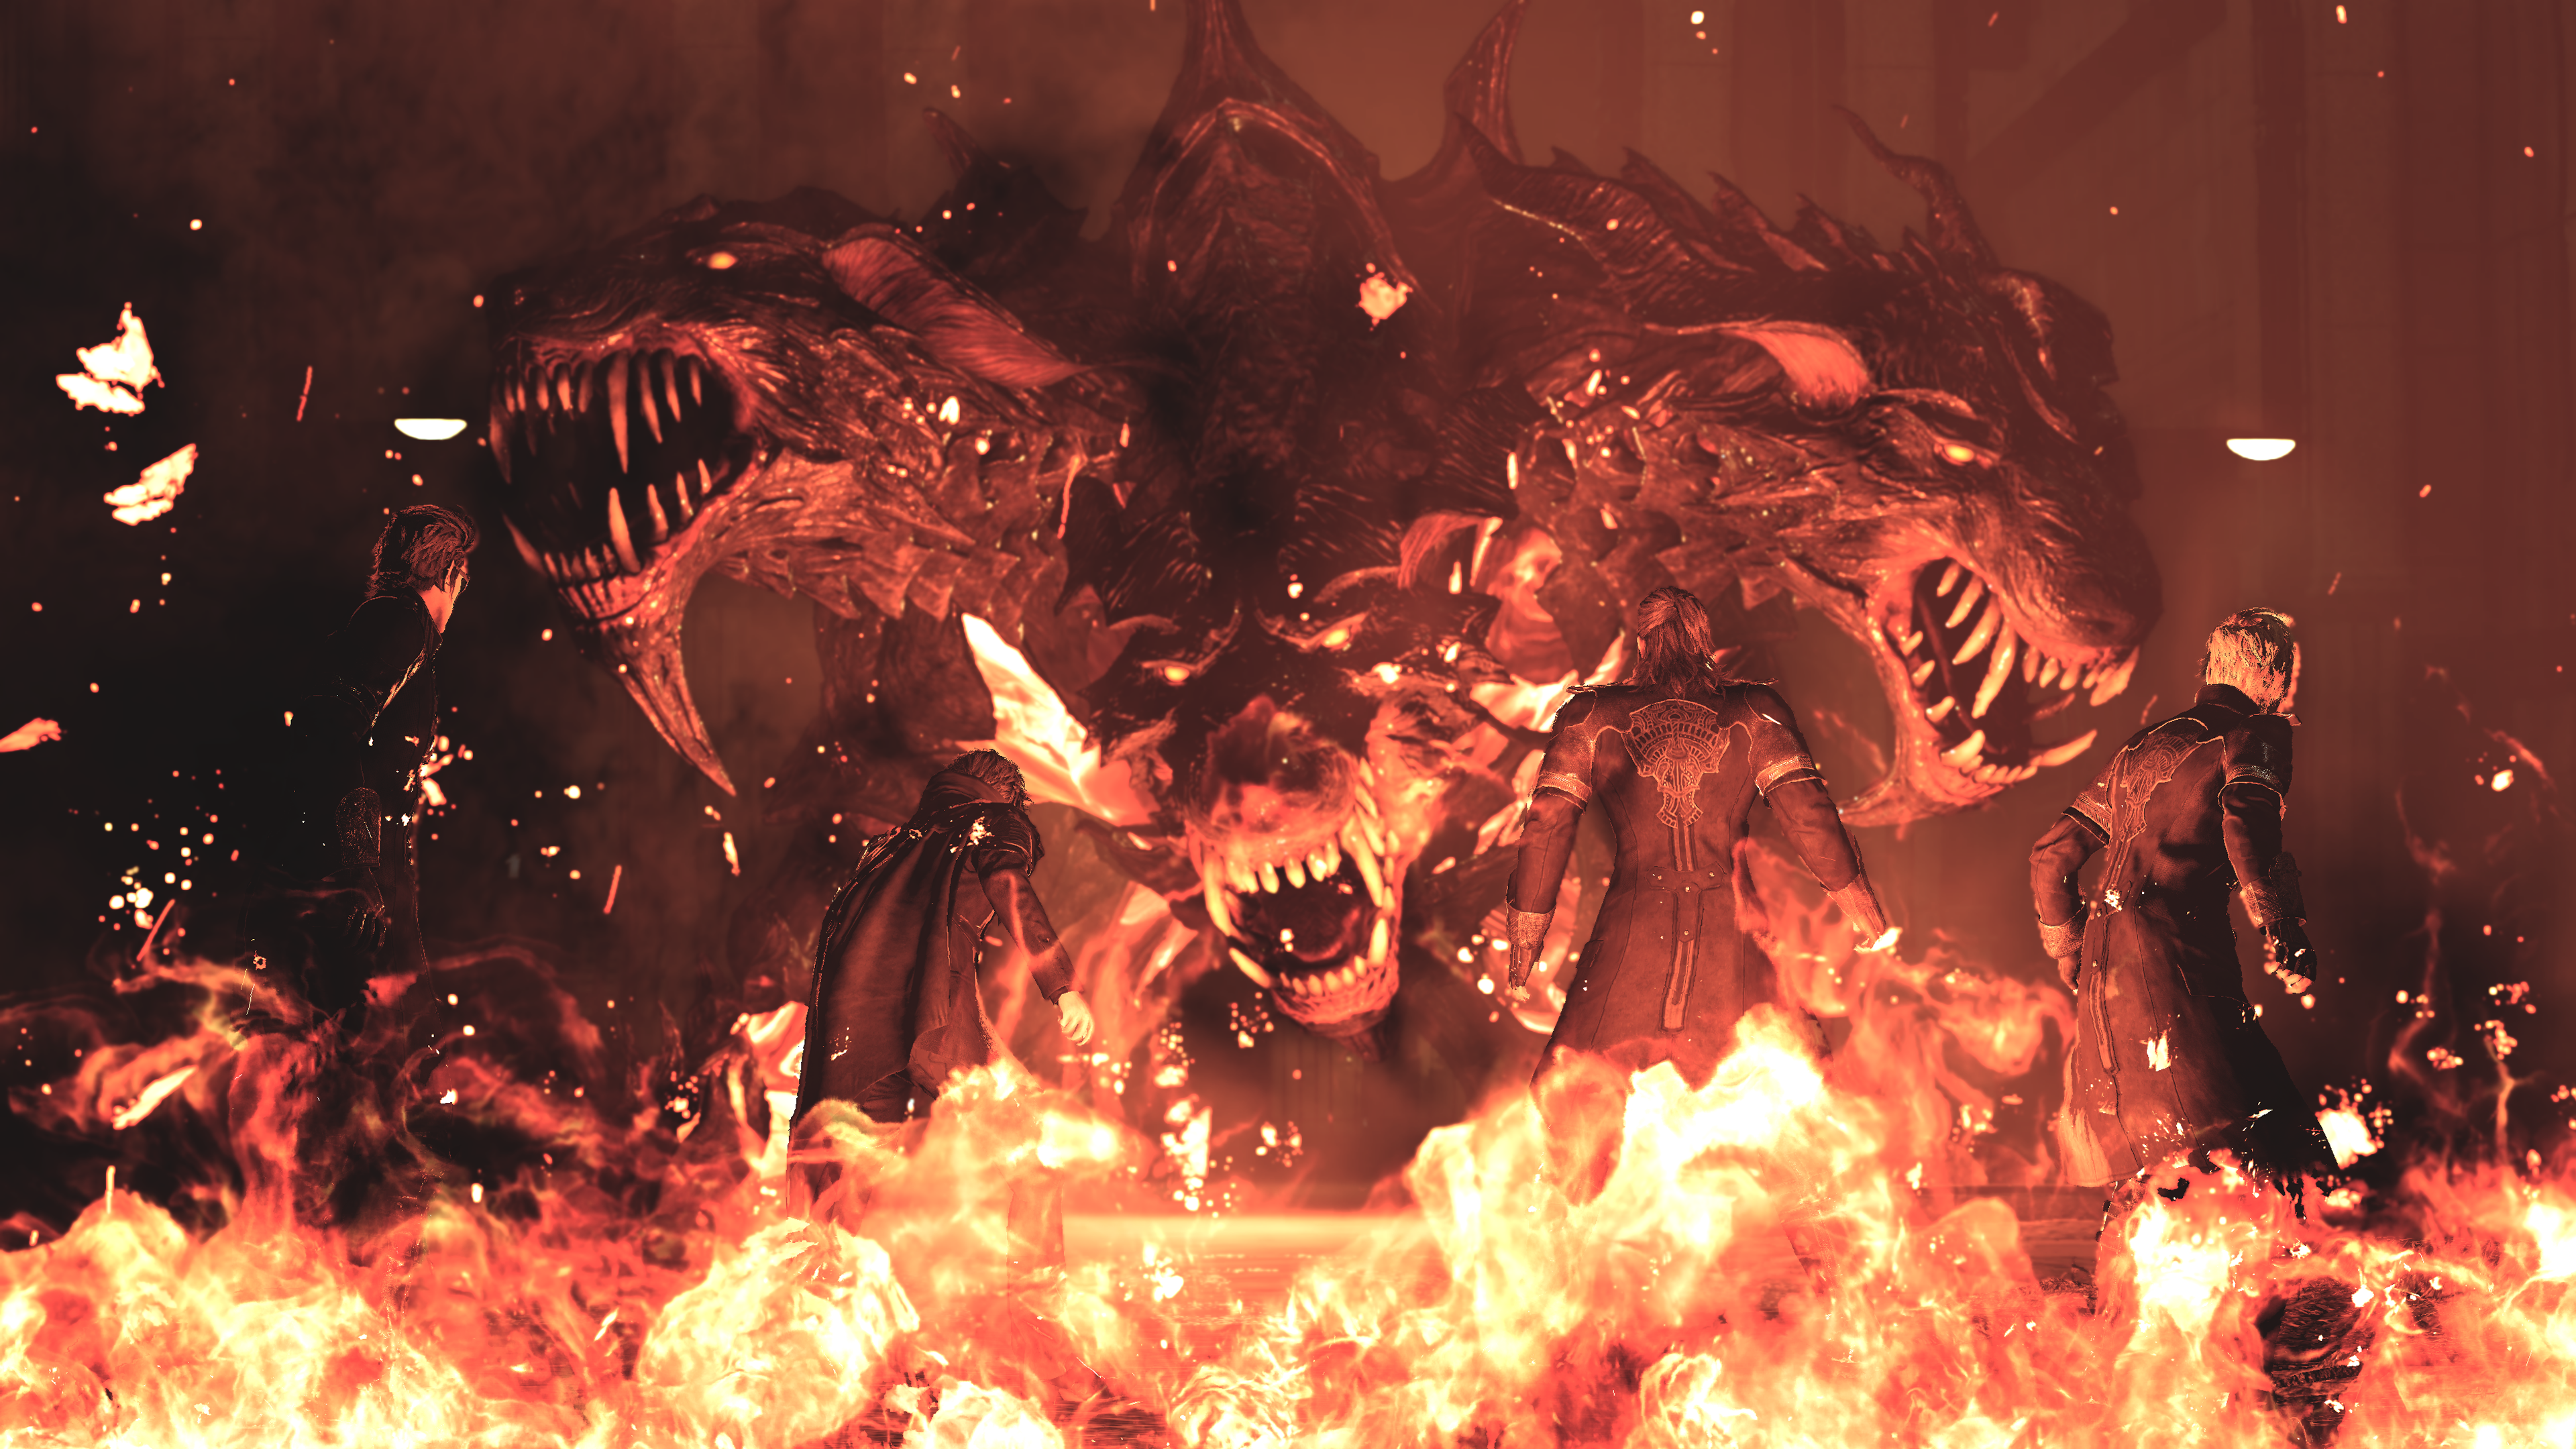 Final Fantasy XV Royal Edition - Cerberus